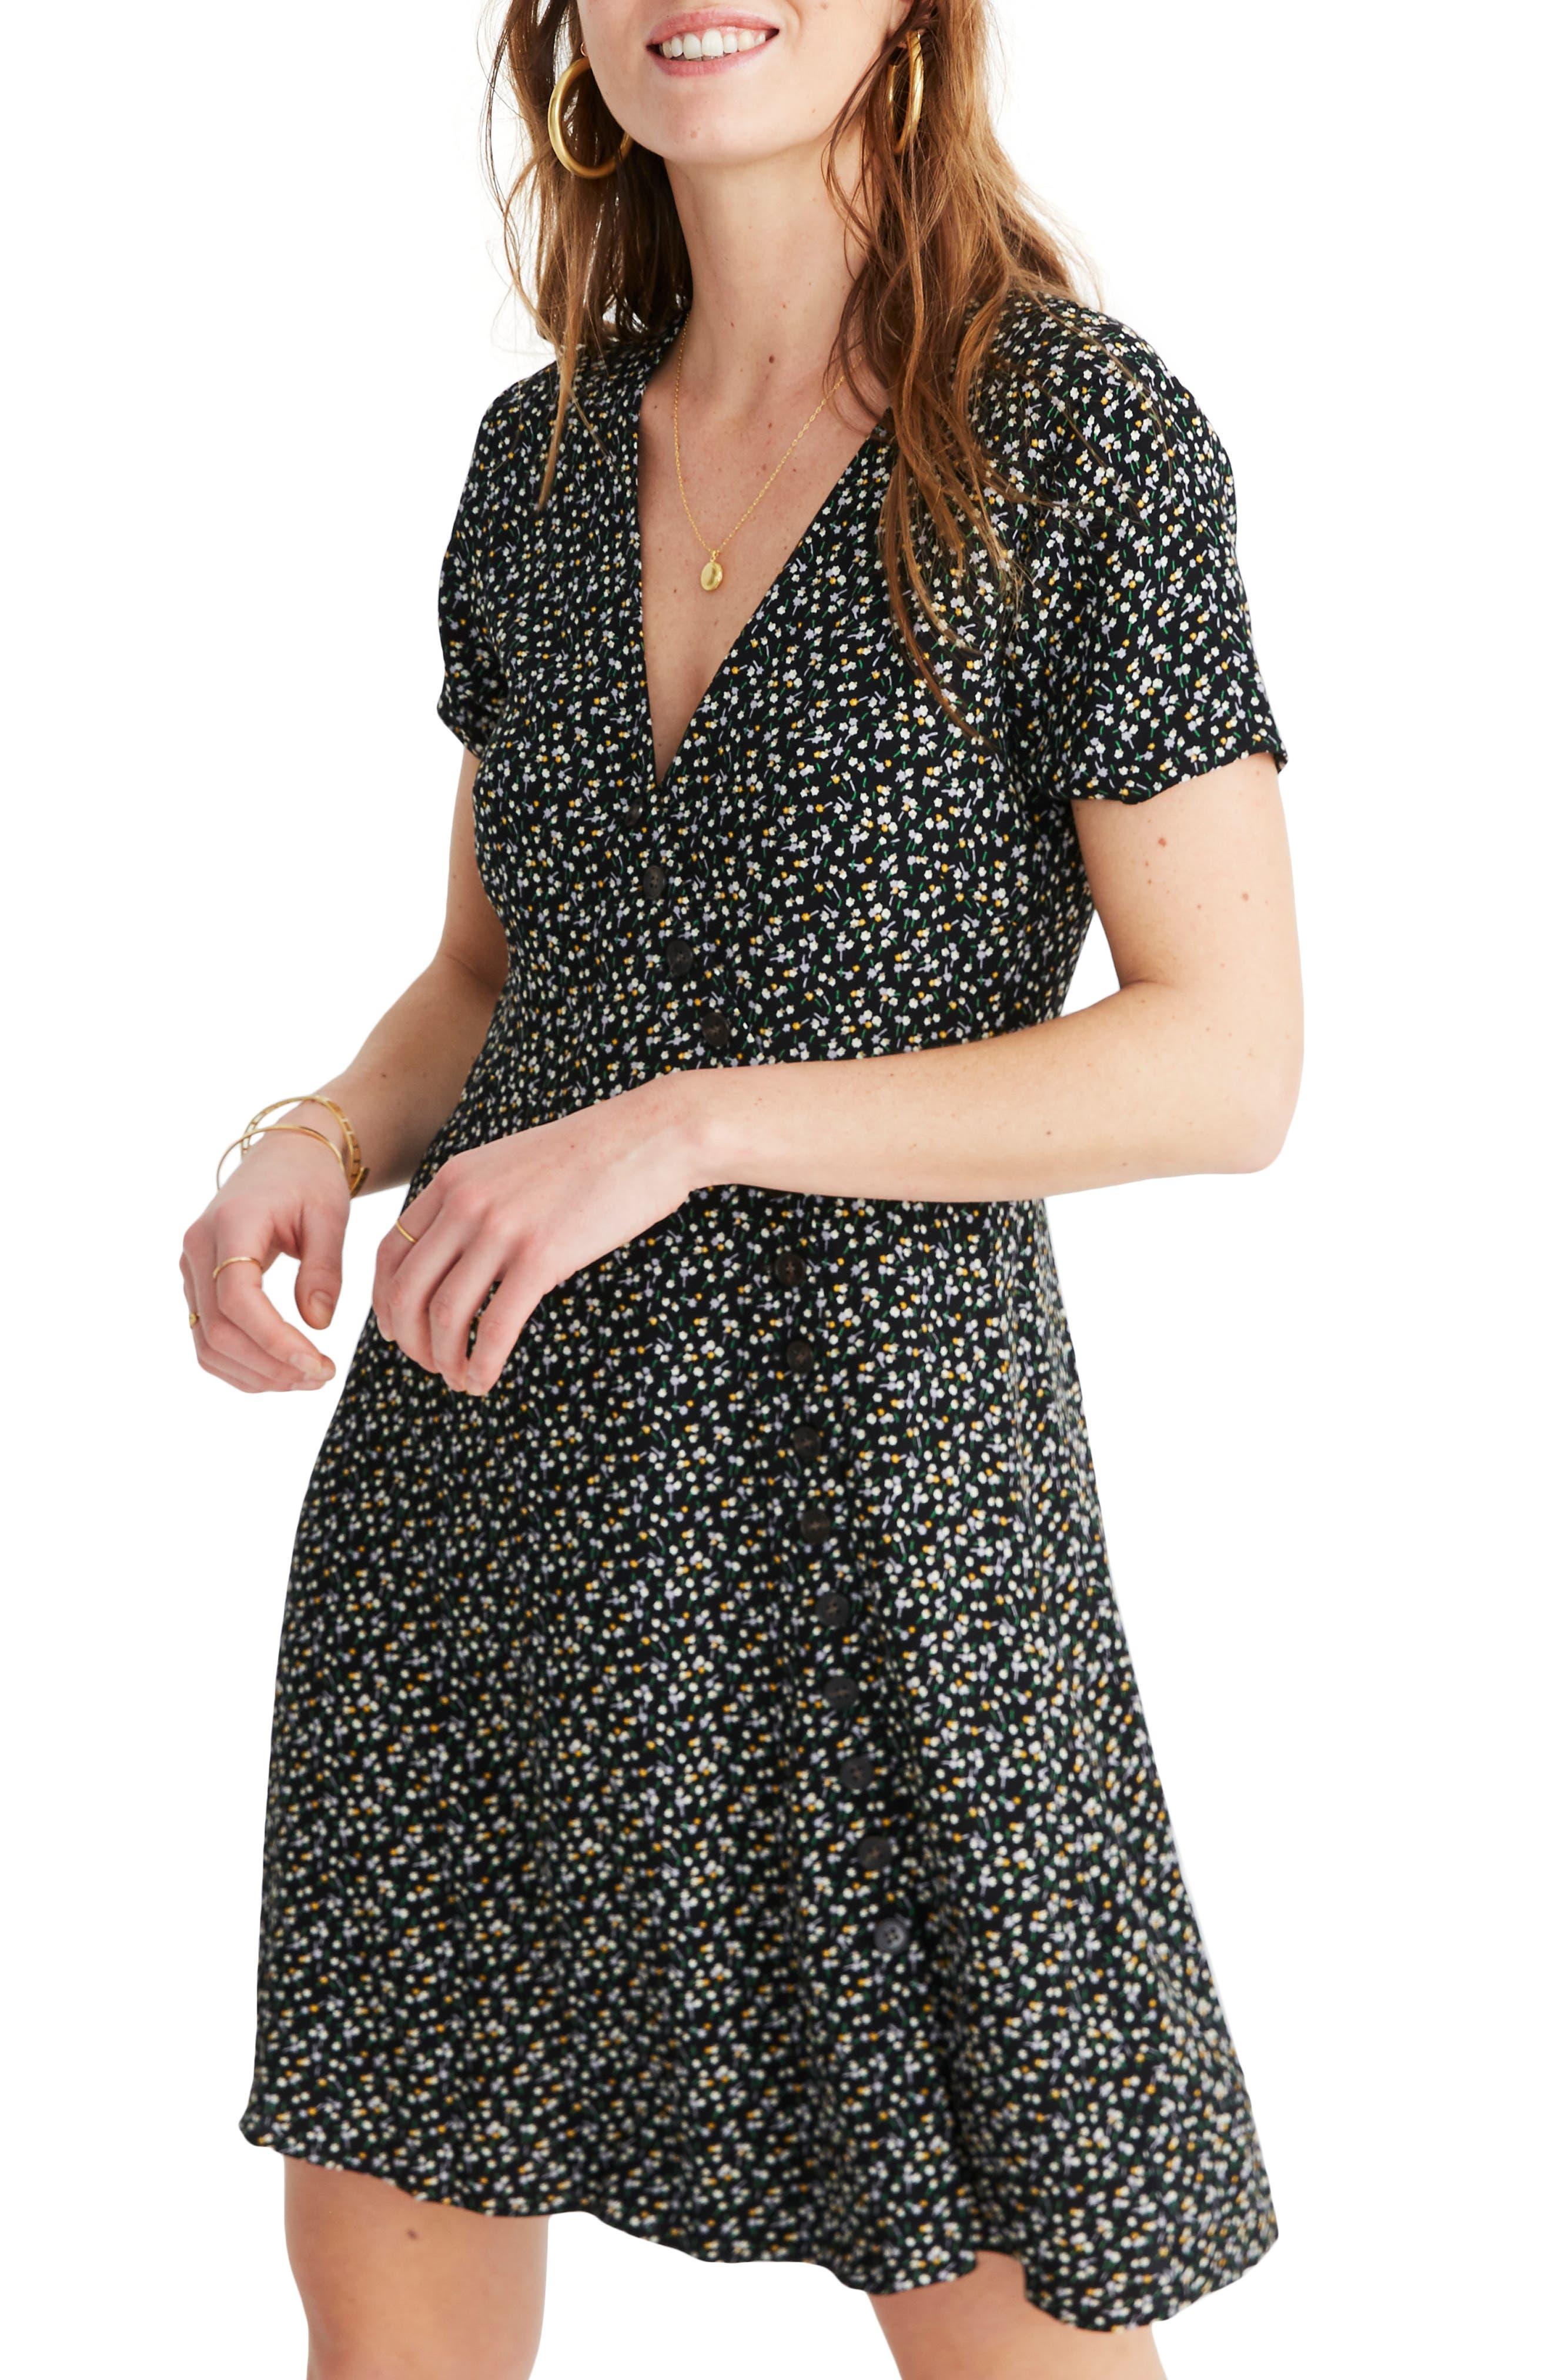 MADEWELL, Button Wrap Dress, Main thumbnail 1, color, BLACK FLORAL